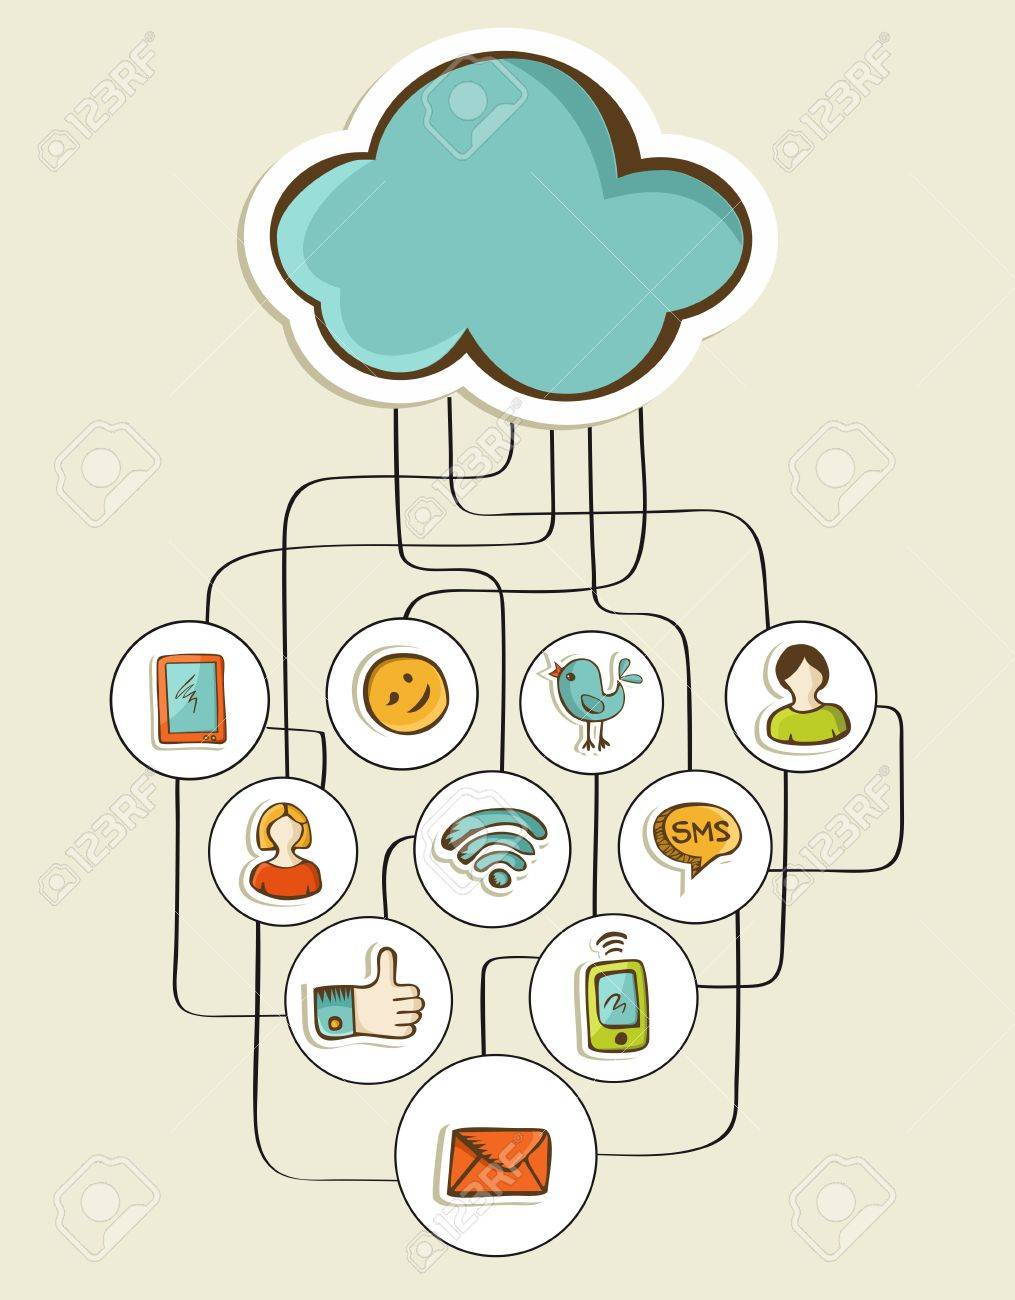 Cloud Computing Hand Drawn Social Network Diagram Vector